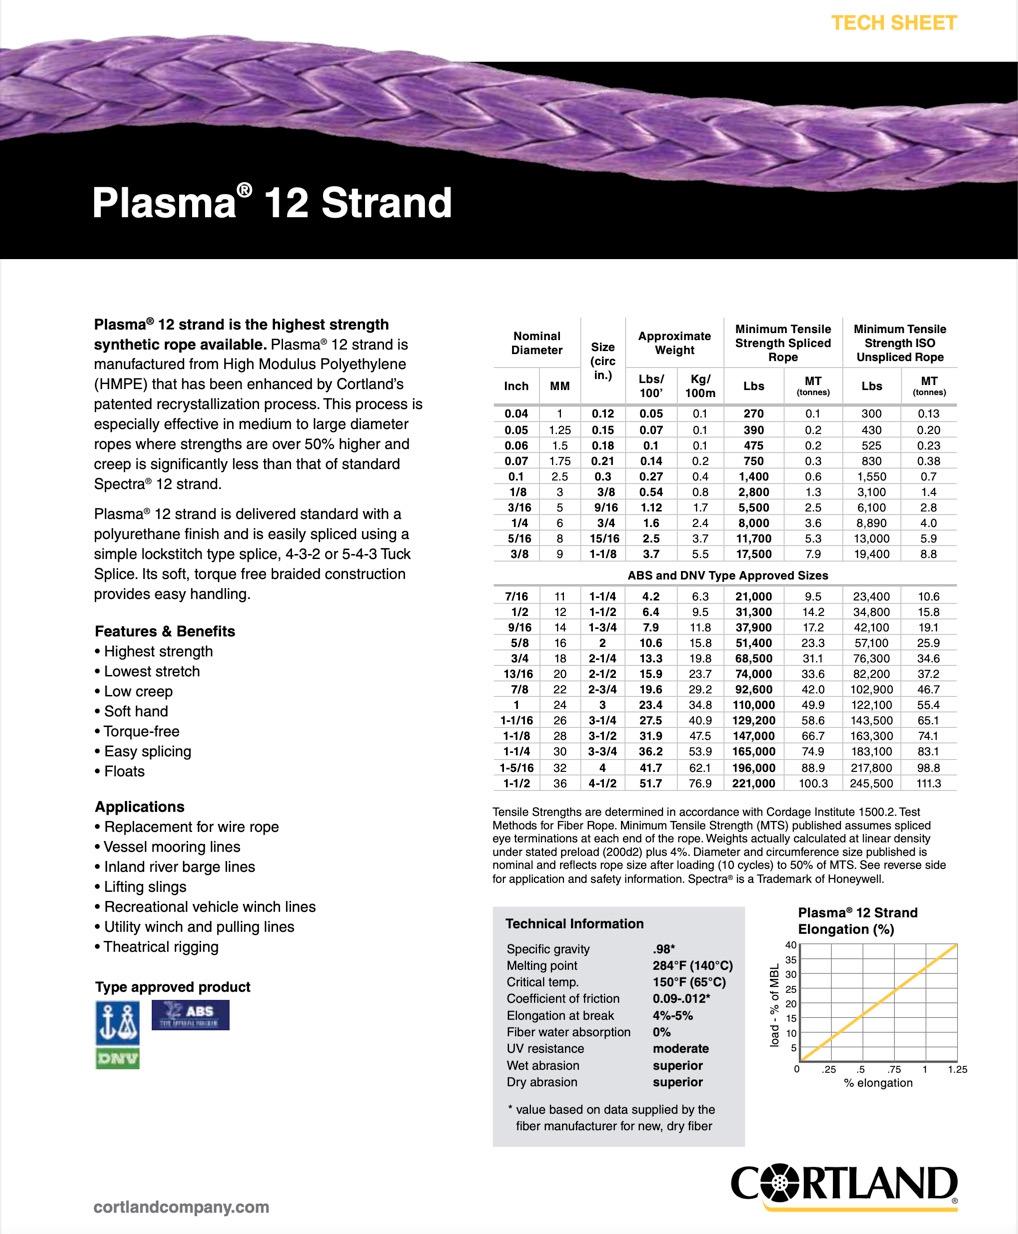 plasma-tech-sheet.jpeg